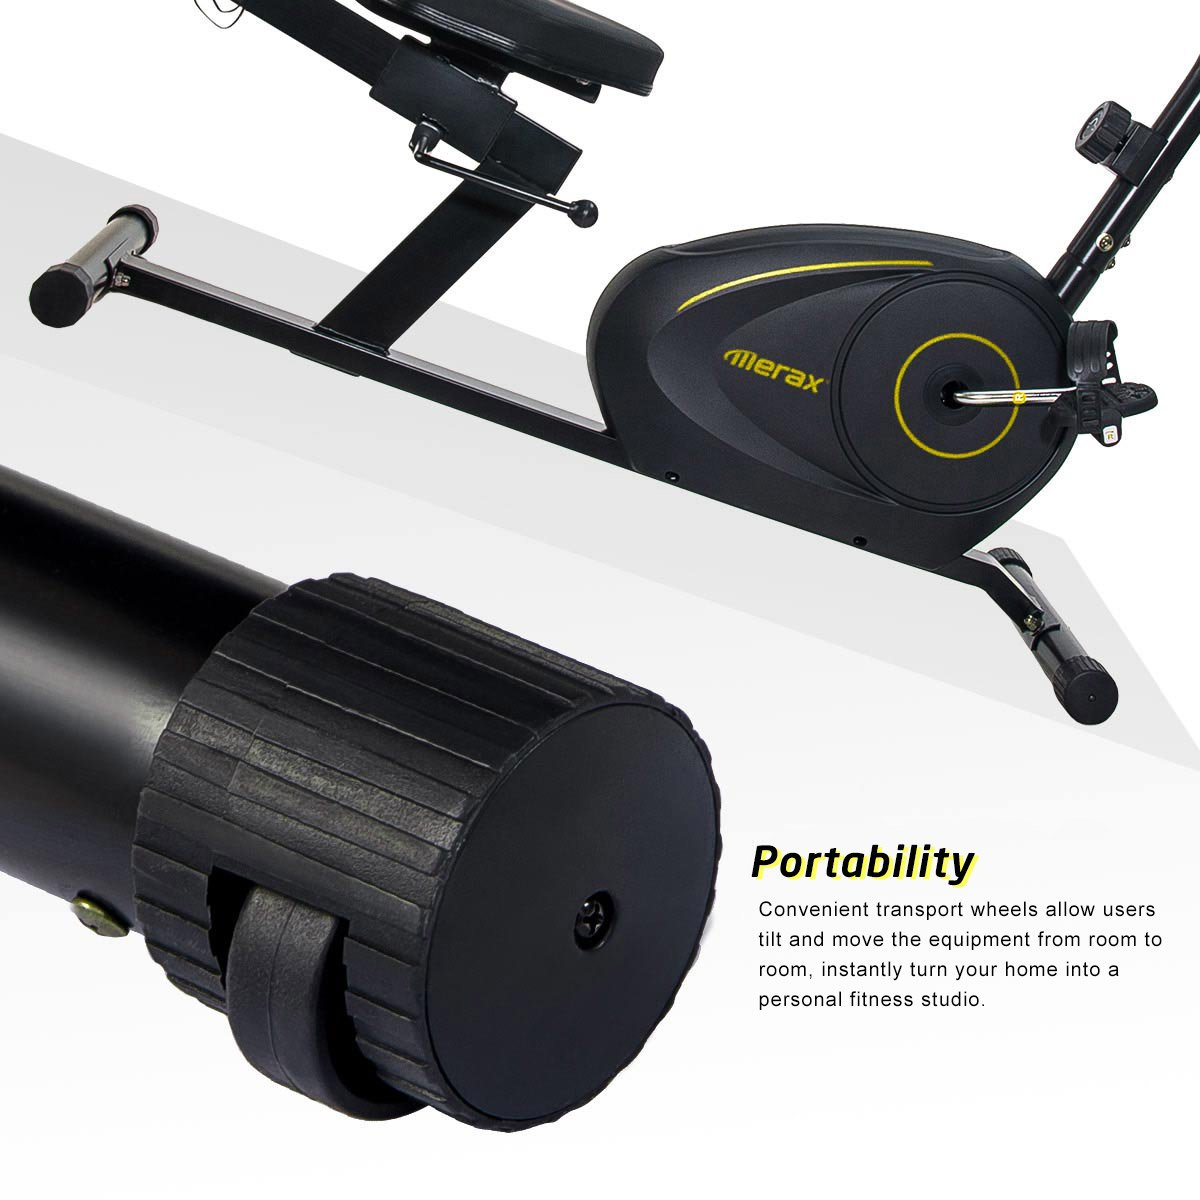 Merax Magnetic Recumbent Exercise Bike | 8-Level Resistance | Quick Adjust Seat (Black 2019) by Merax (Image #7)